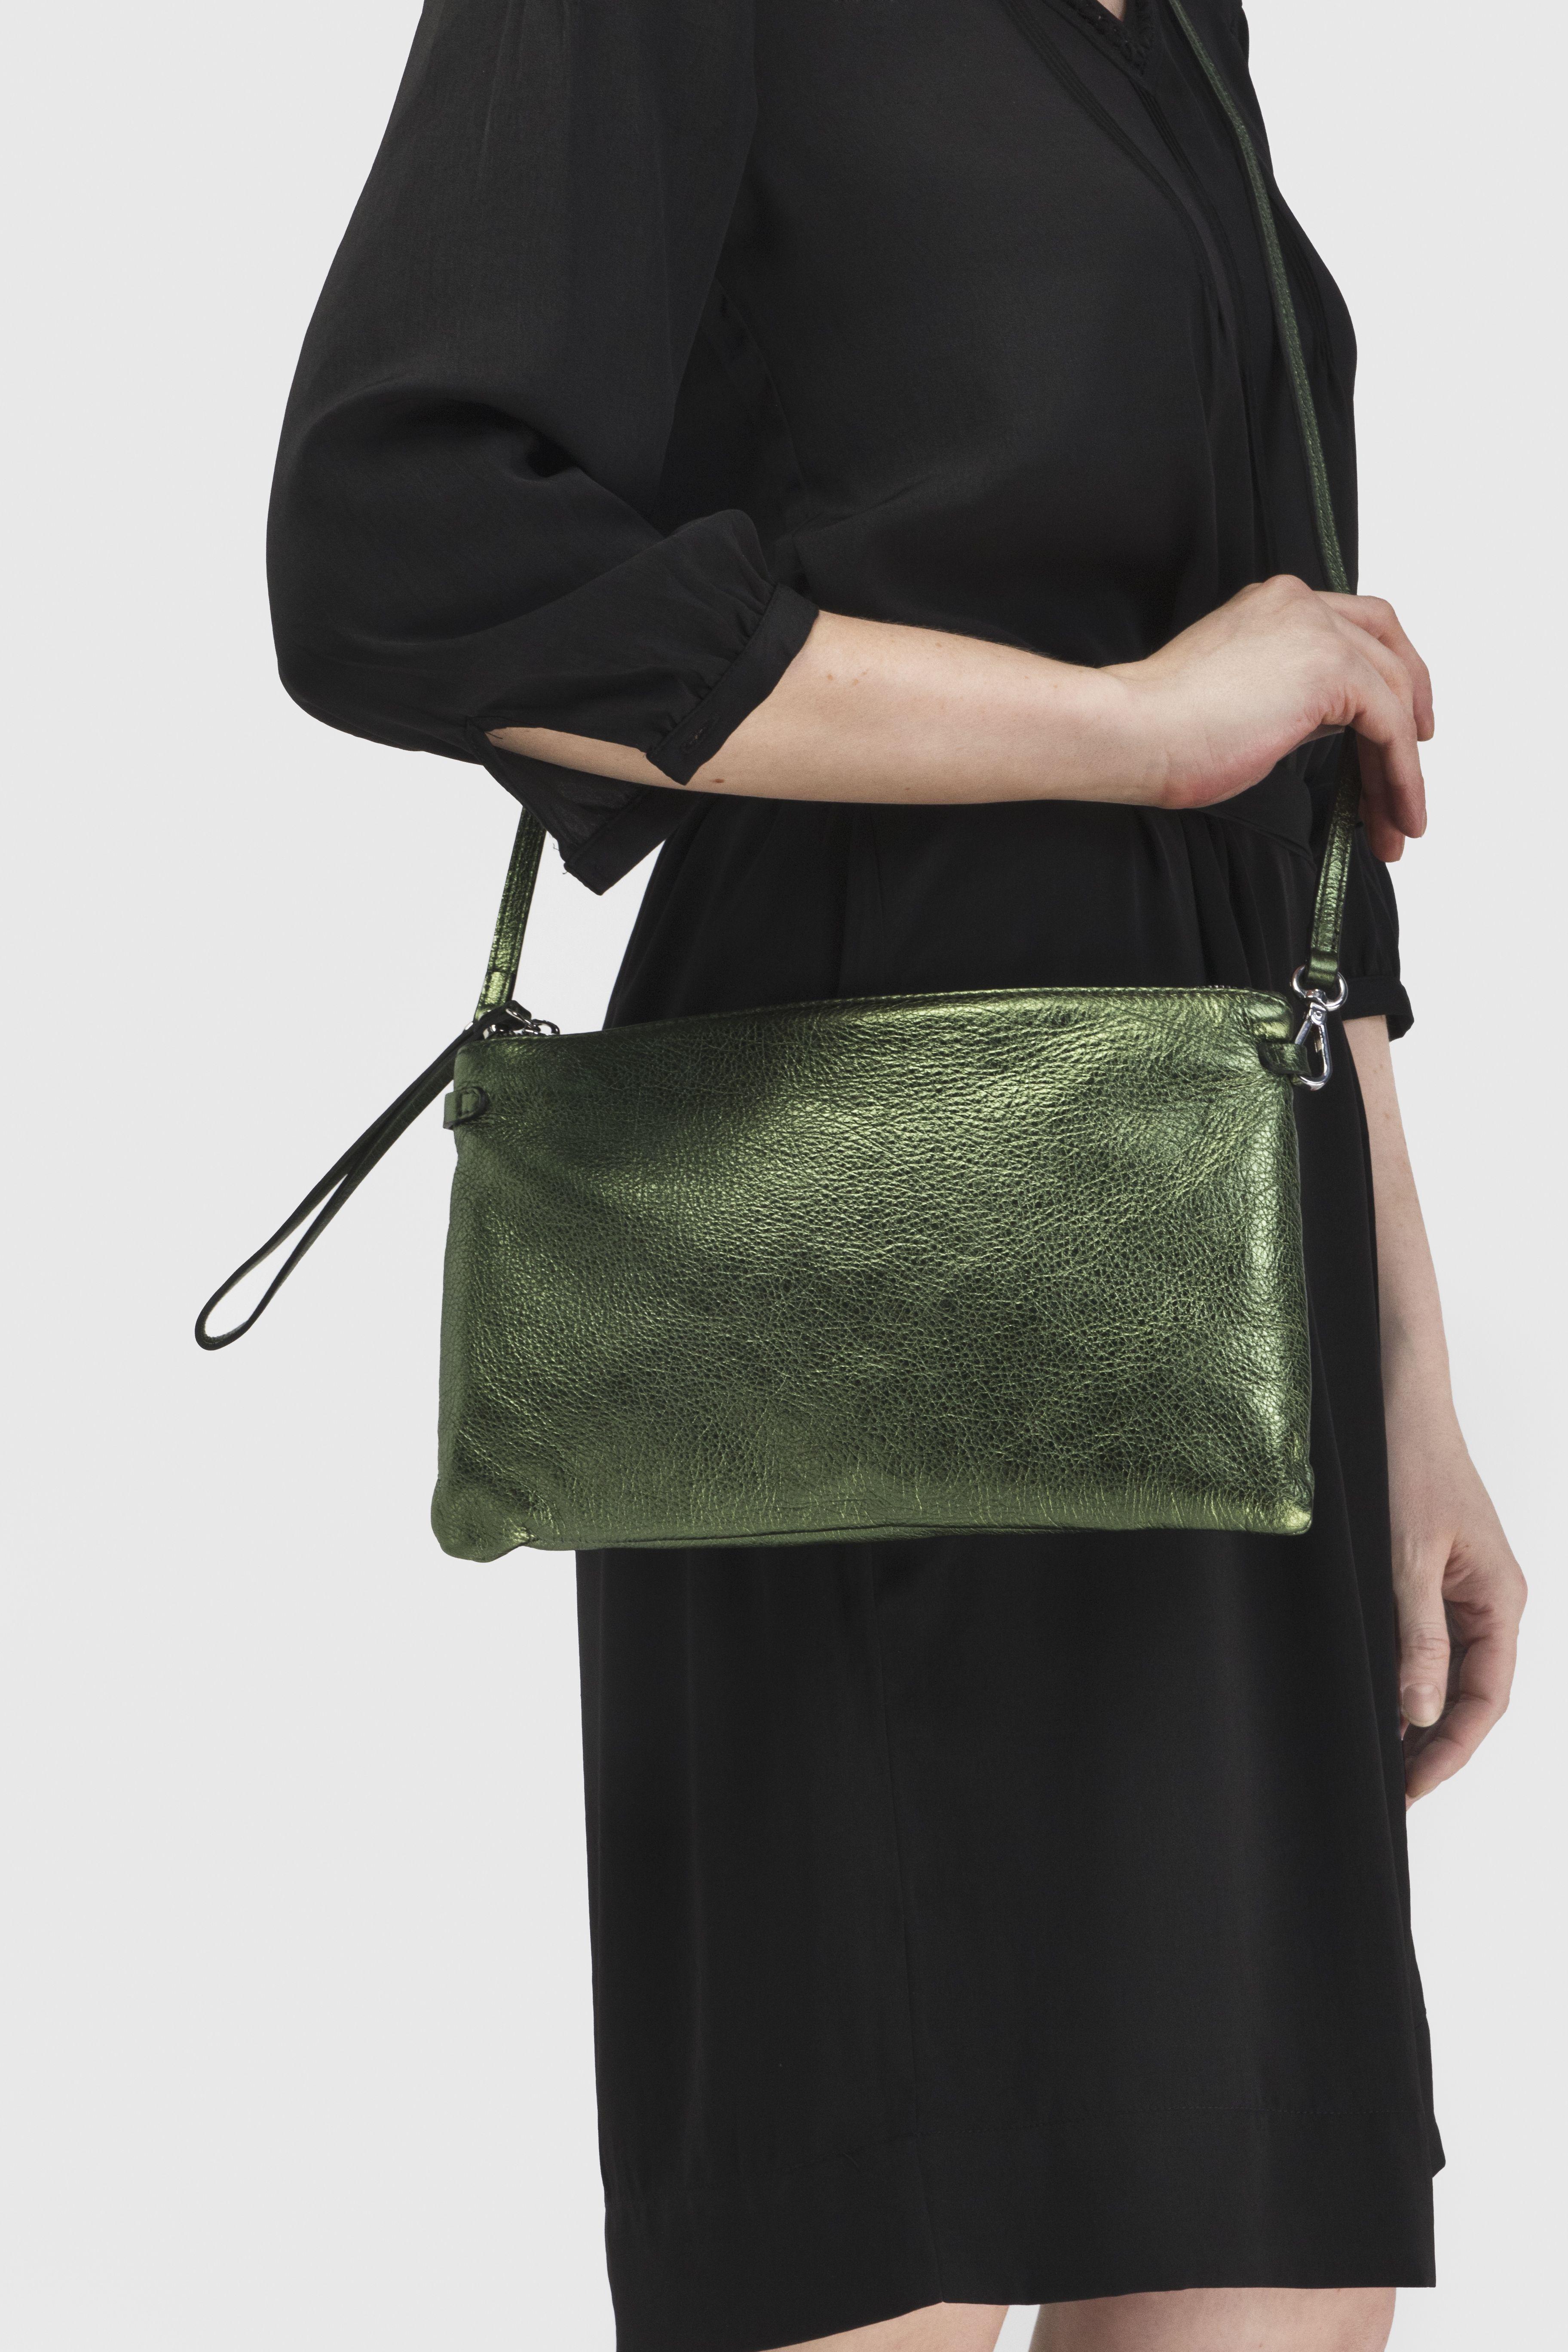 dfdc1651b5c Gianni Chiarini | bags | metallic | SS18 | Van den Assem | Bags ...